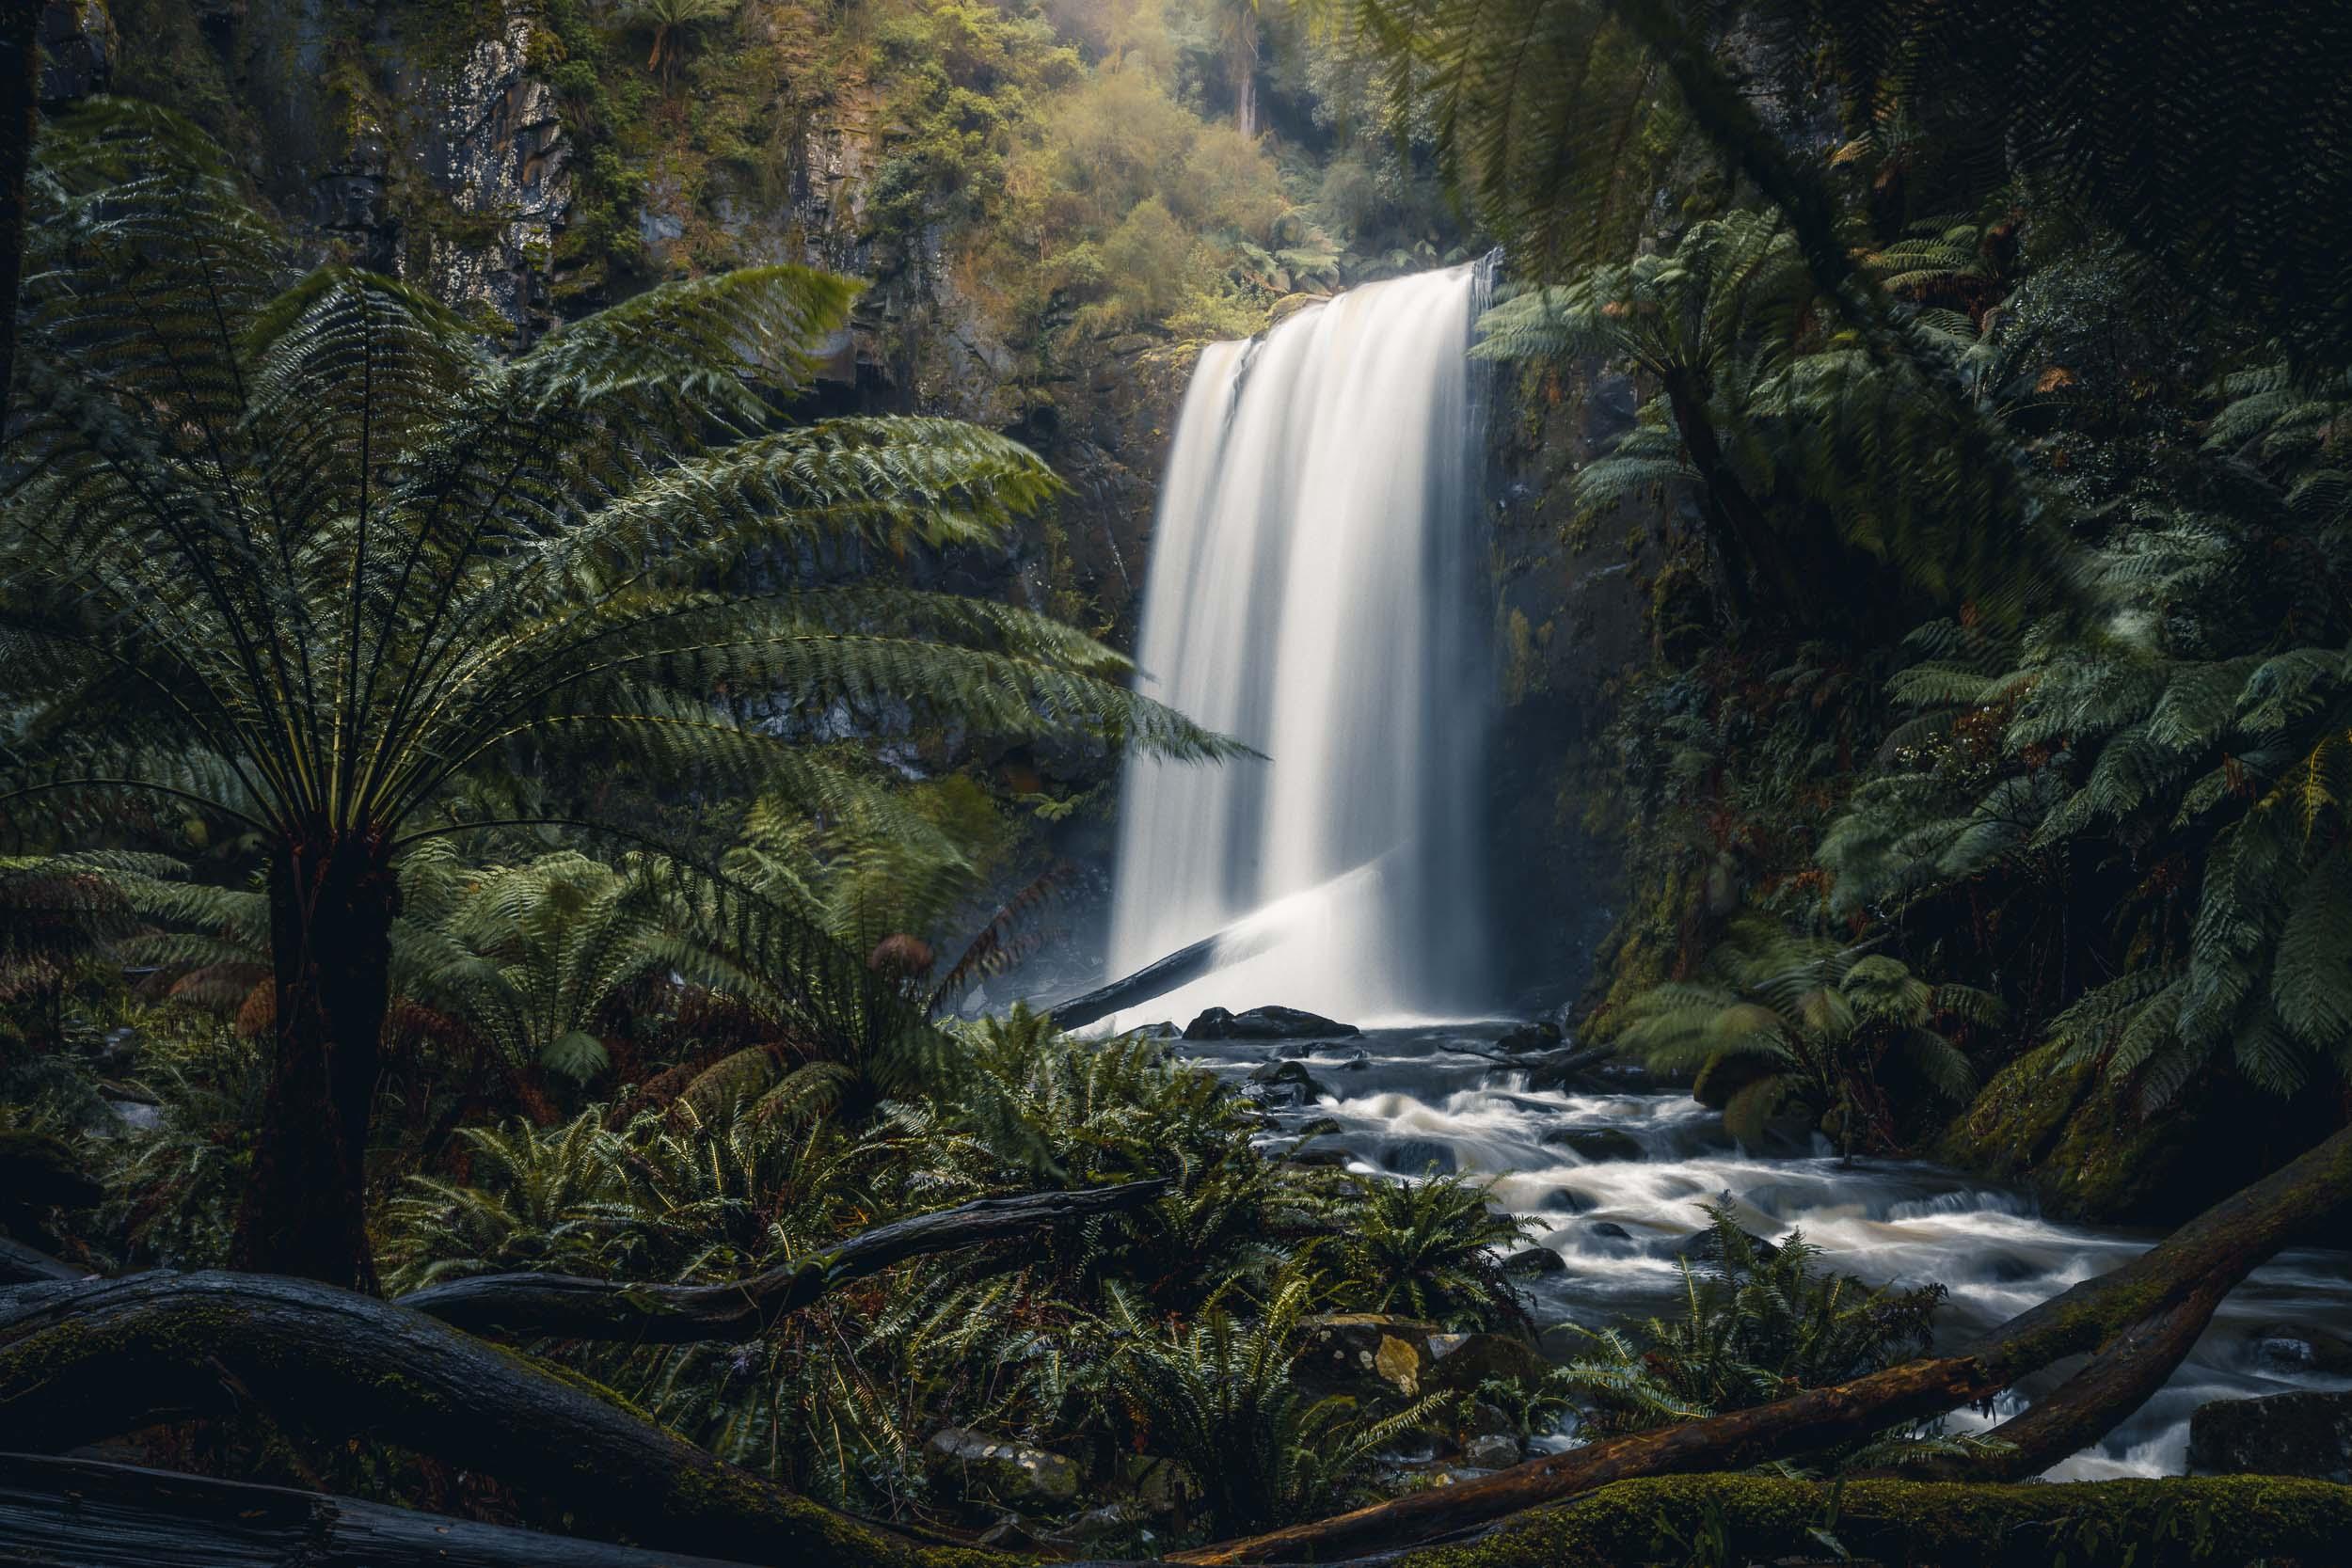 The magical Hopetoun Falls